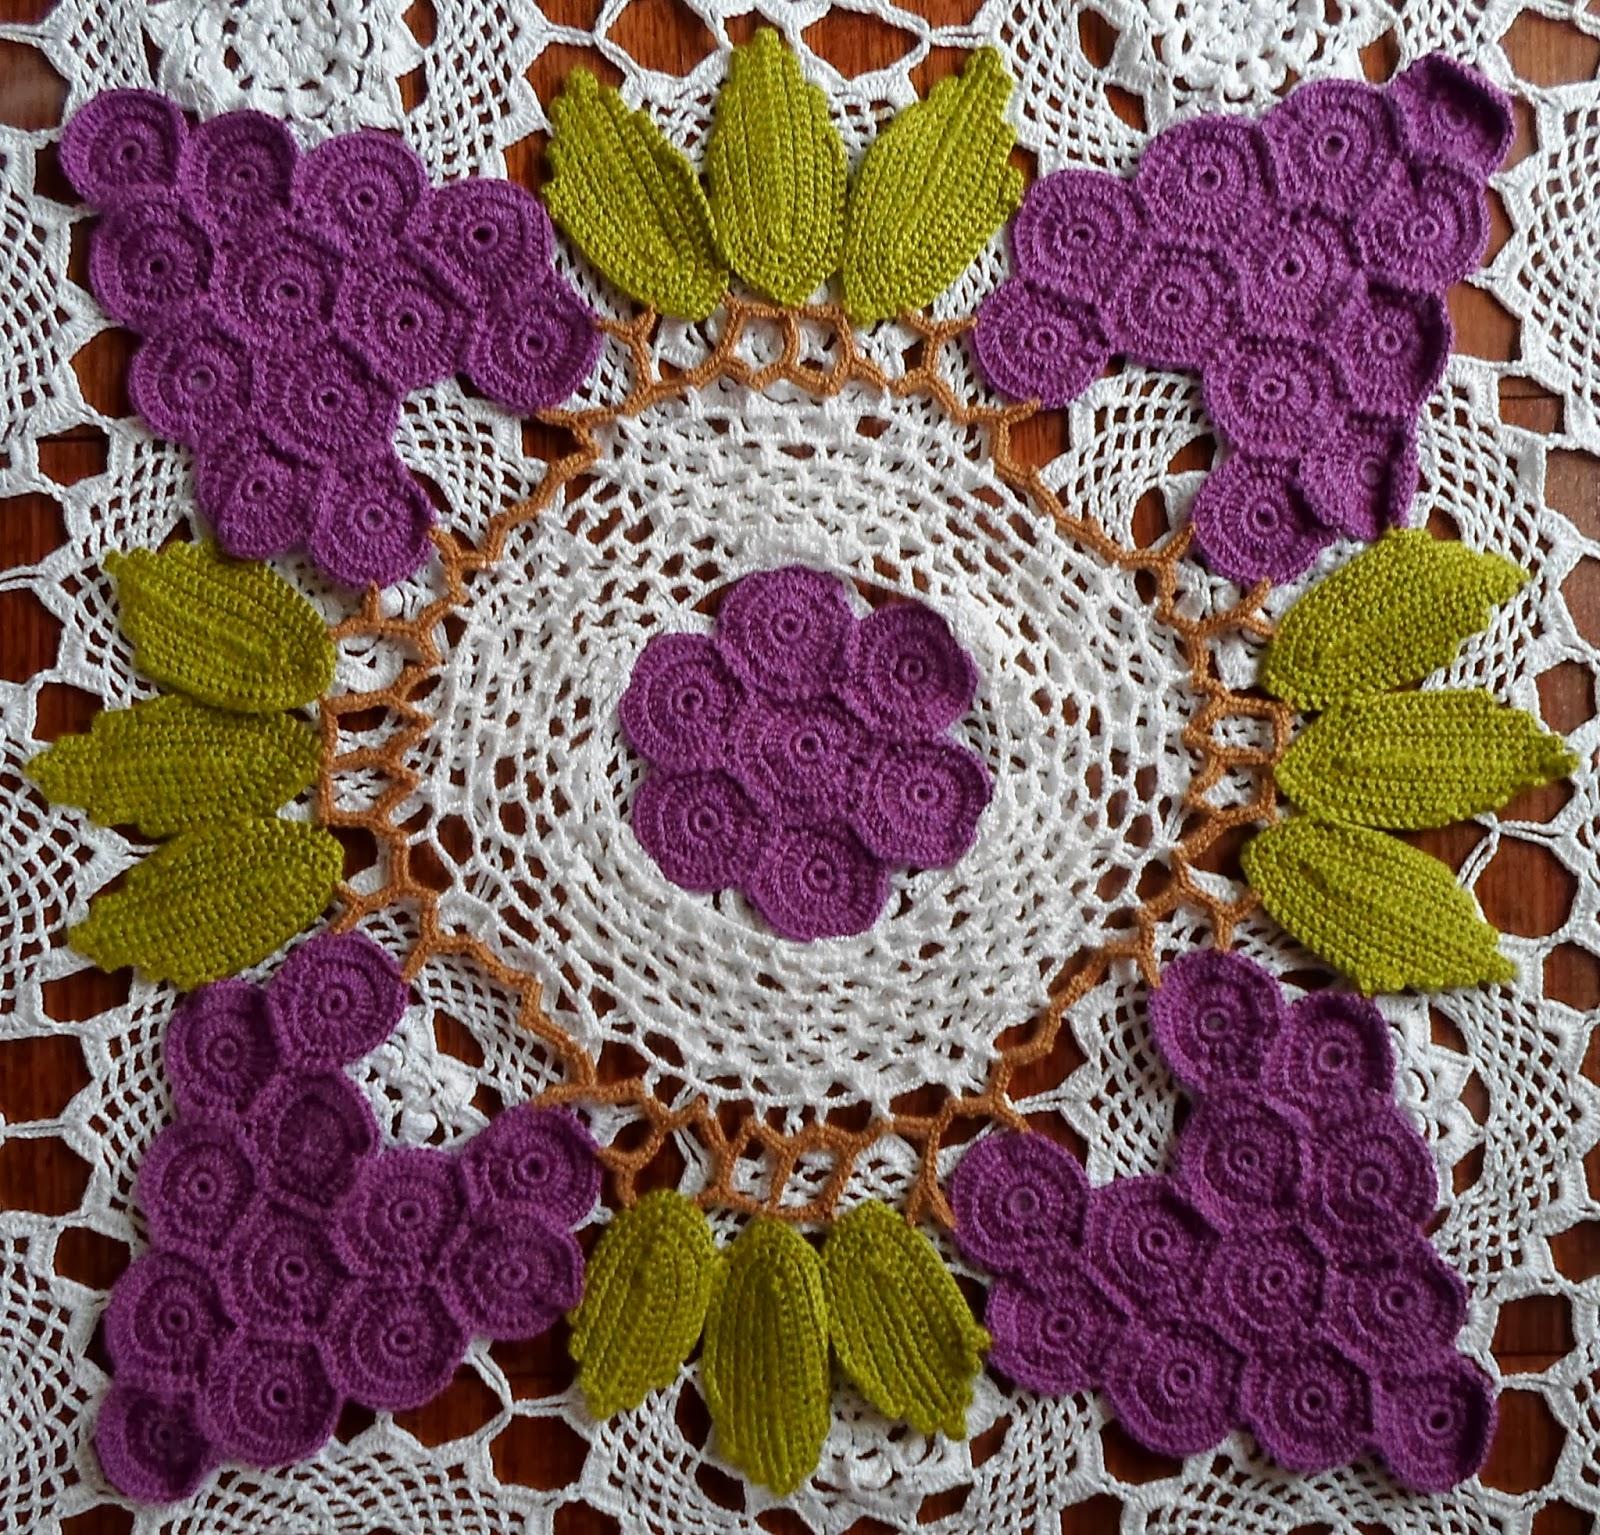 la ovejita carpetitas tejidas a crochet. Black Bedroom Furniture Sets. Home Design Ideas